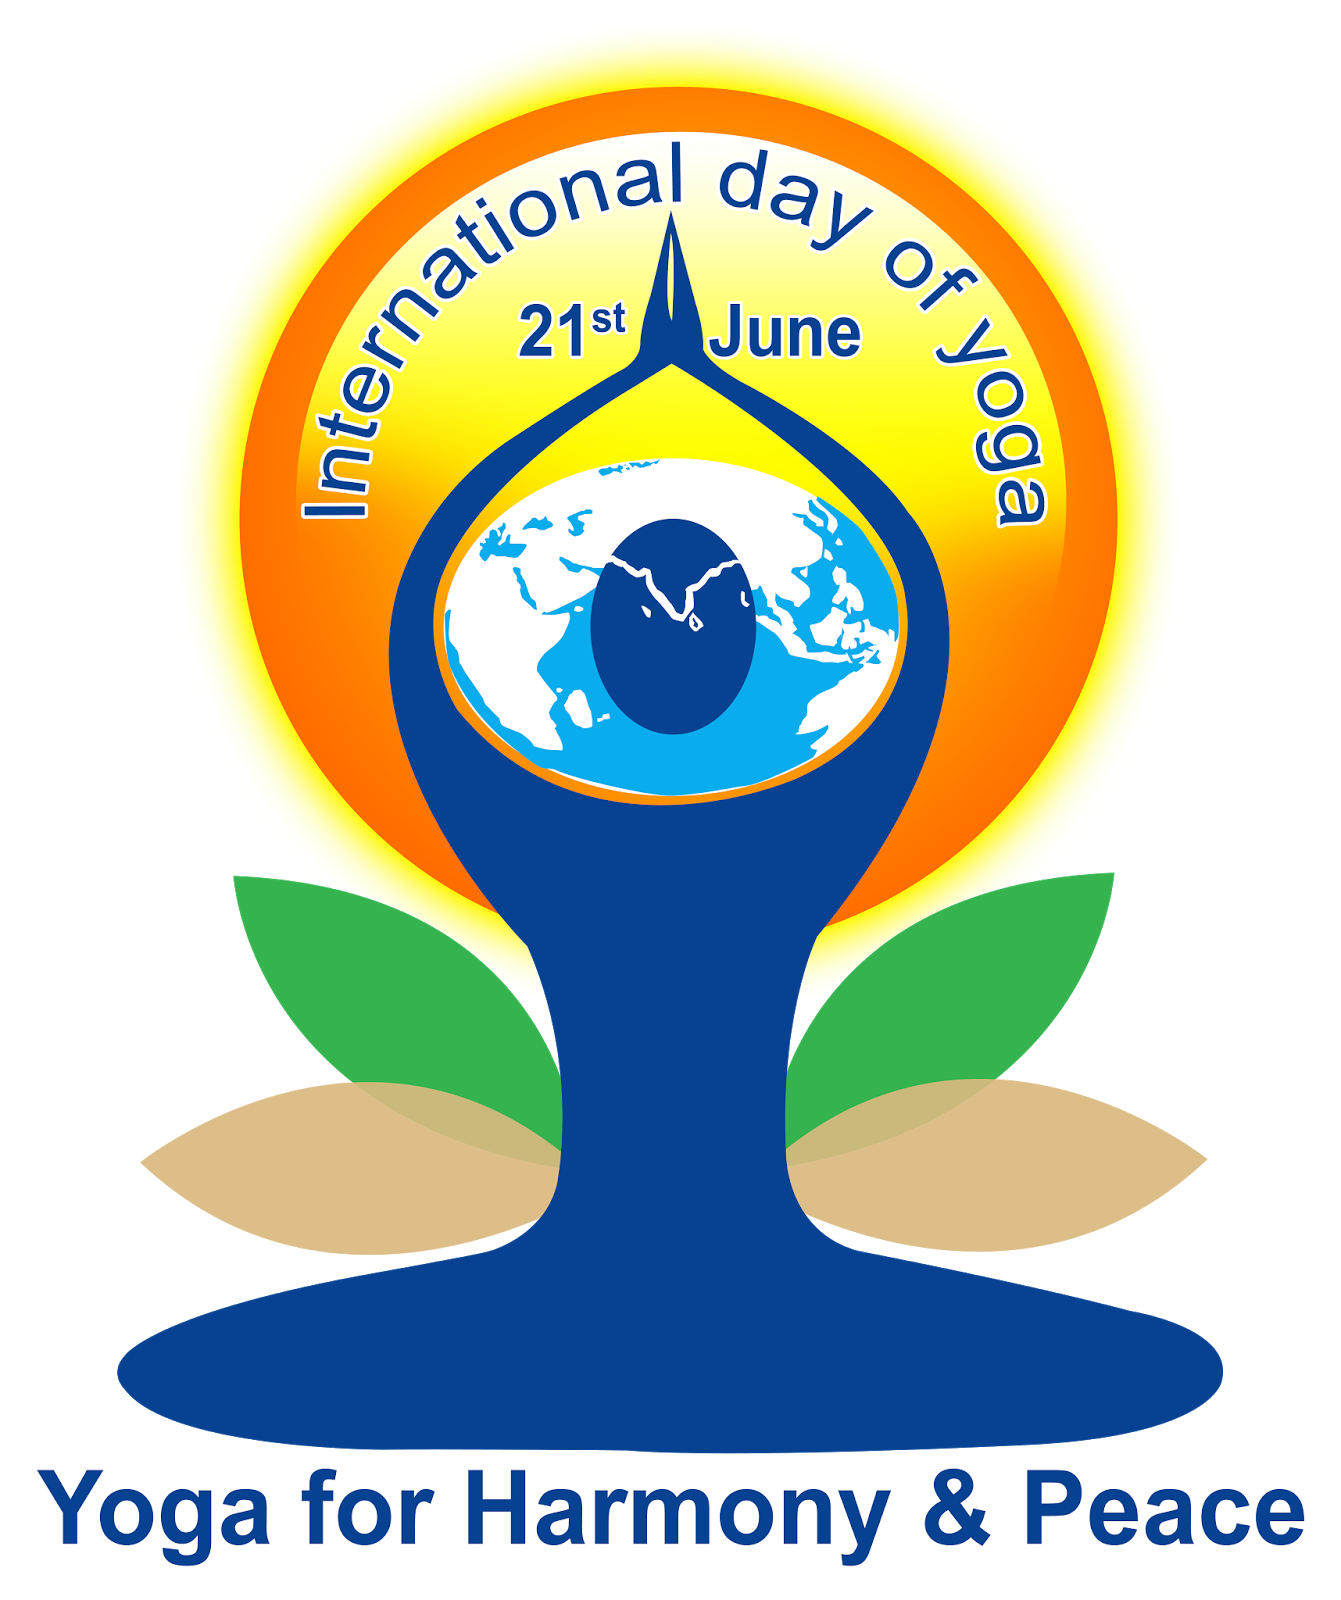 international yoga day logo psd file free downloads.